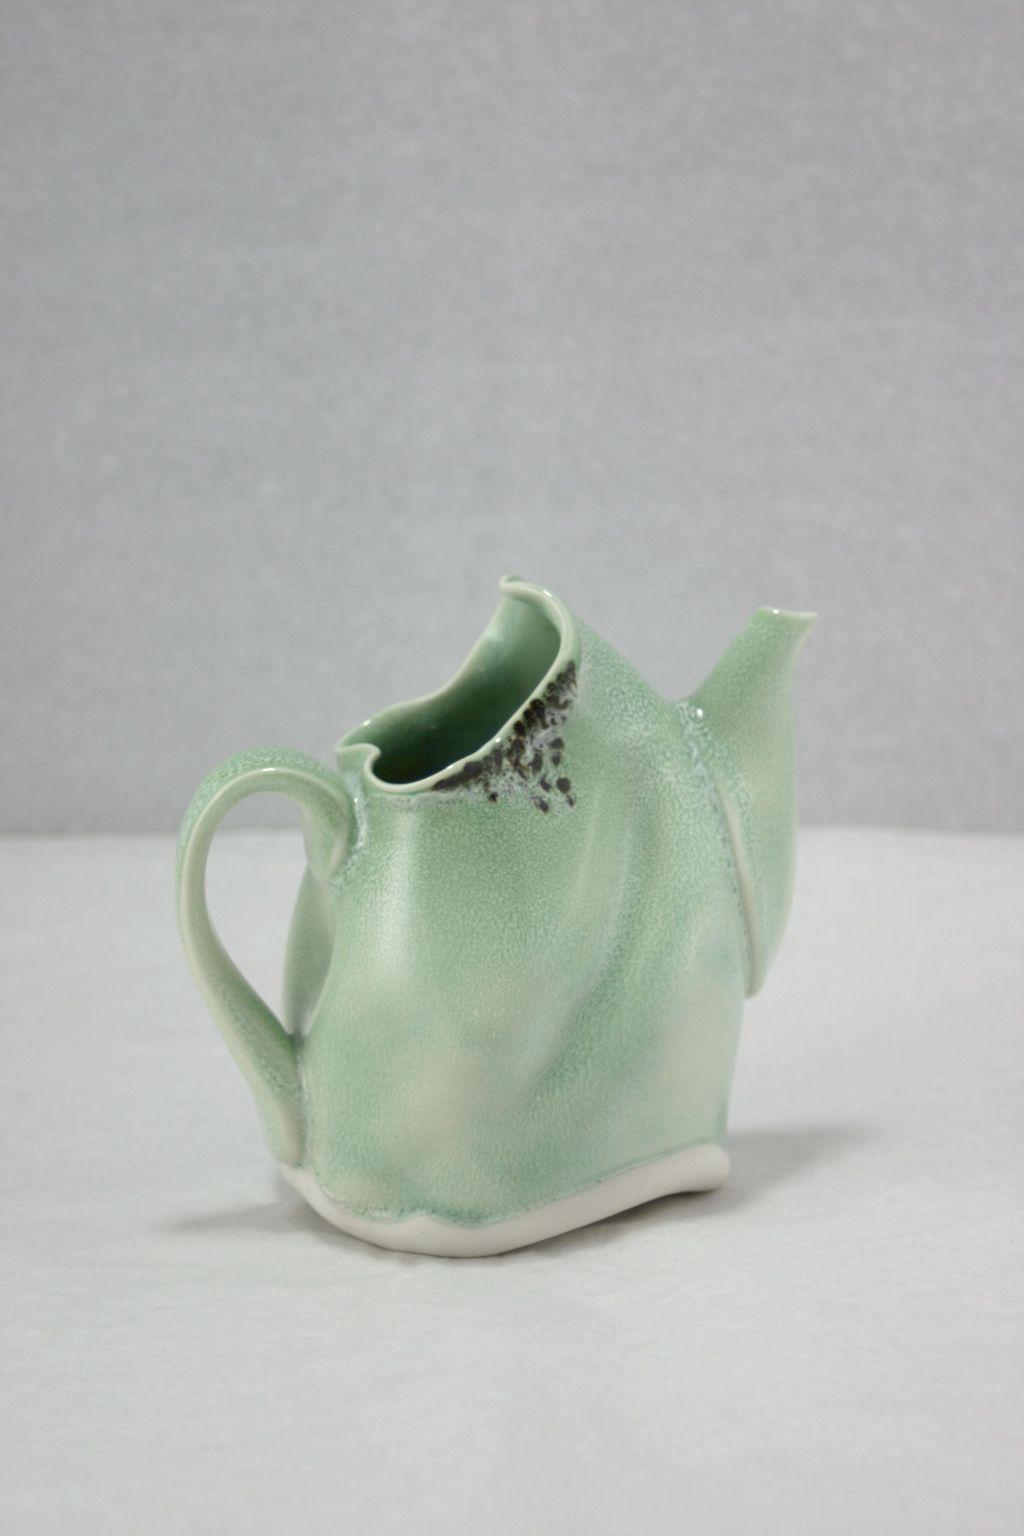 Ewer: Handmade